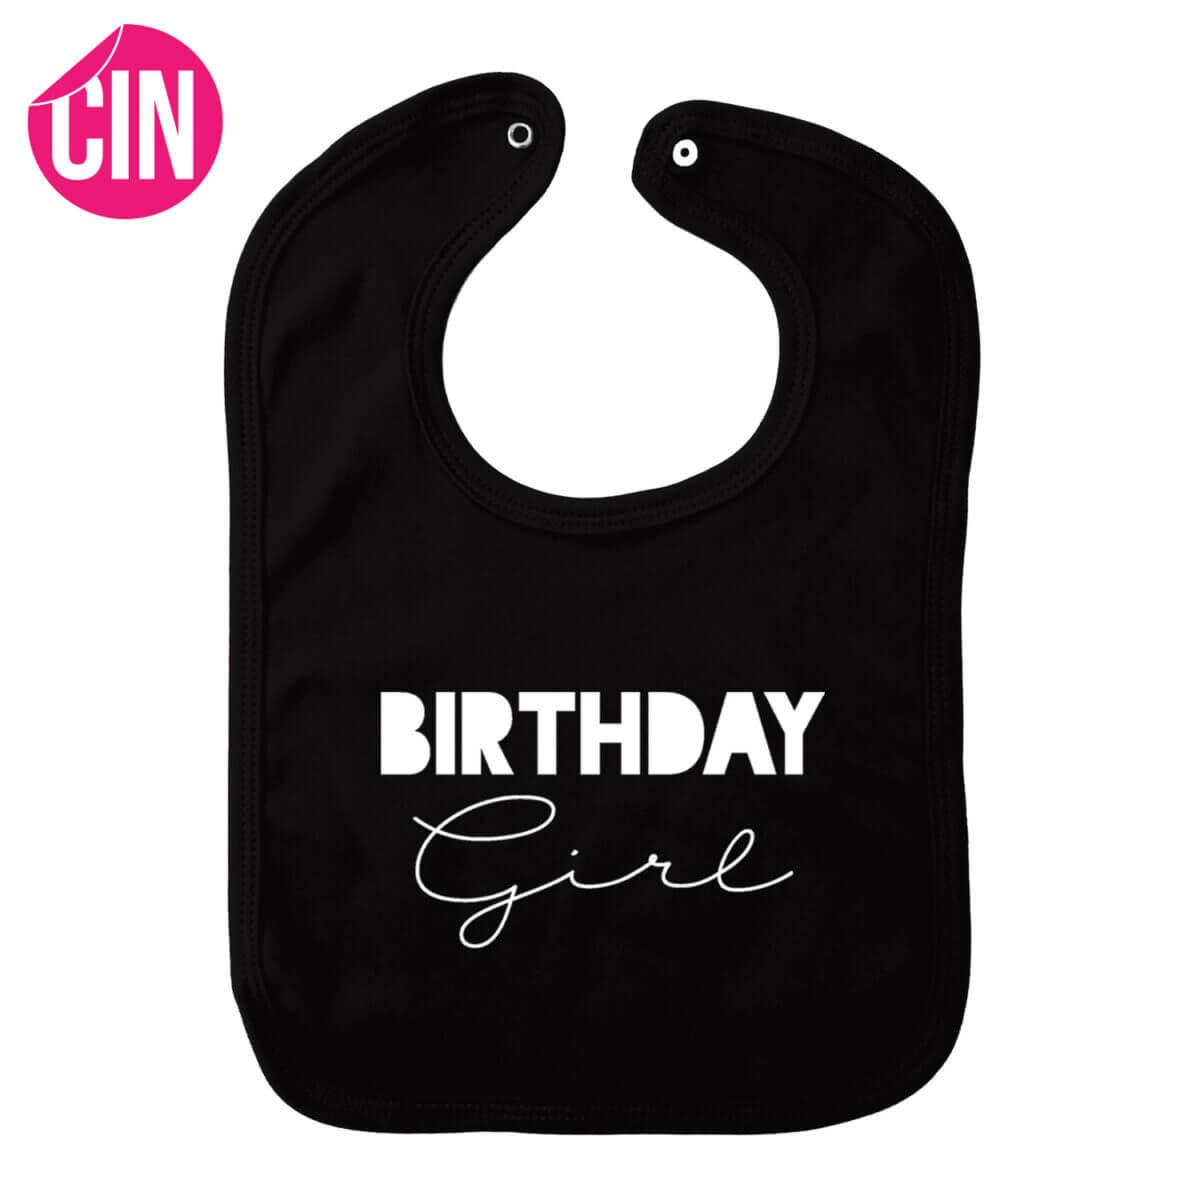 birthday girl slabber zwart cindysigns